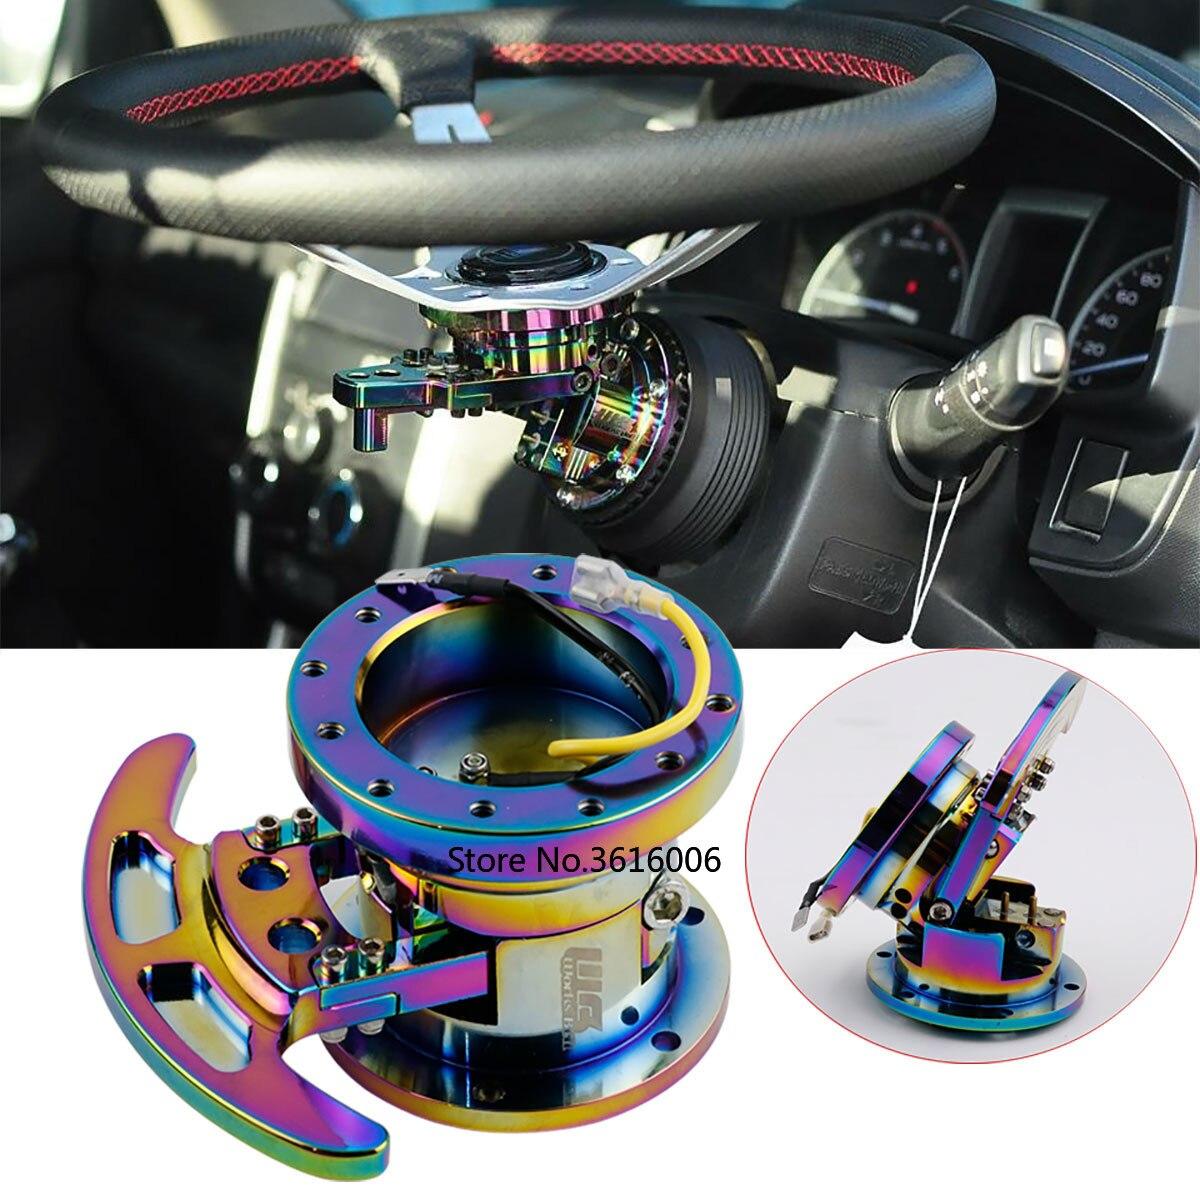 Color : Black Works Bell GTC Tilt Racing Steering Wheel Quick Release Hub Kit Adapter Body Removable Snap Off Boss Kit